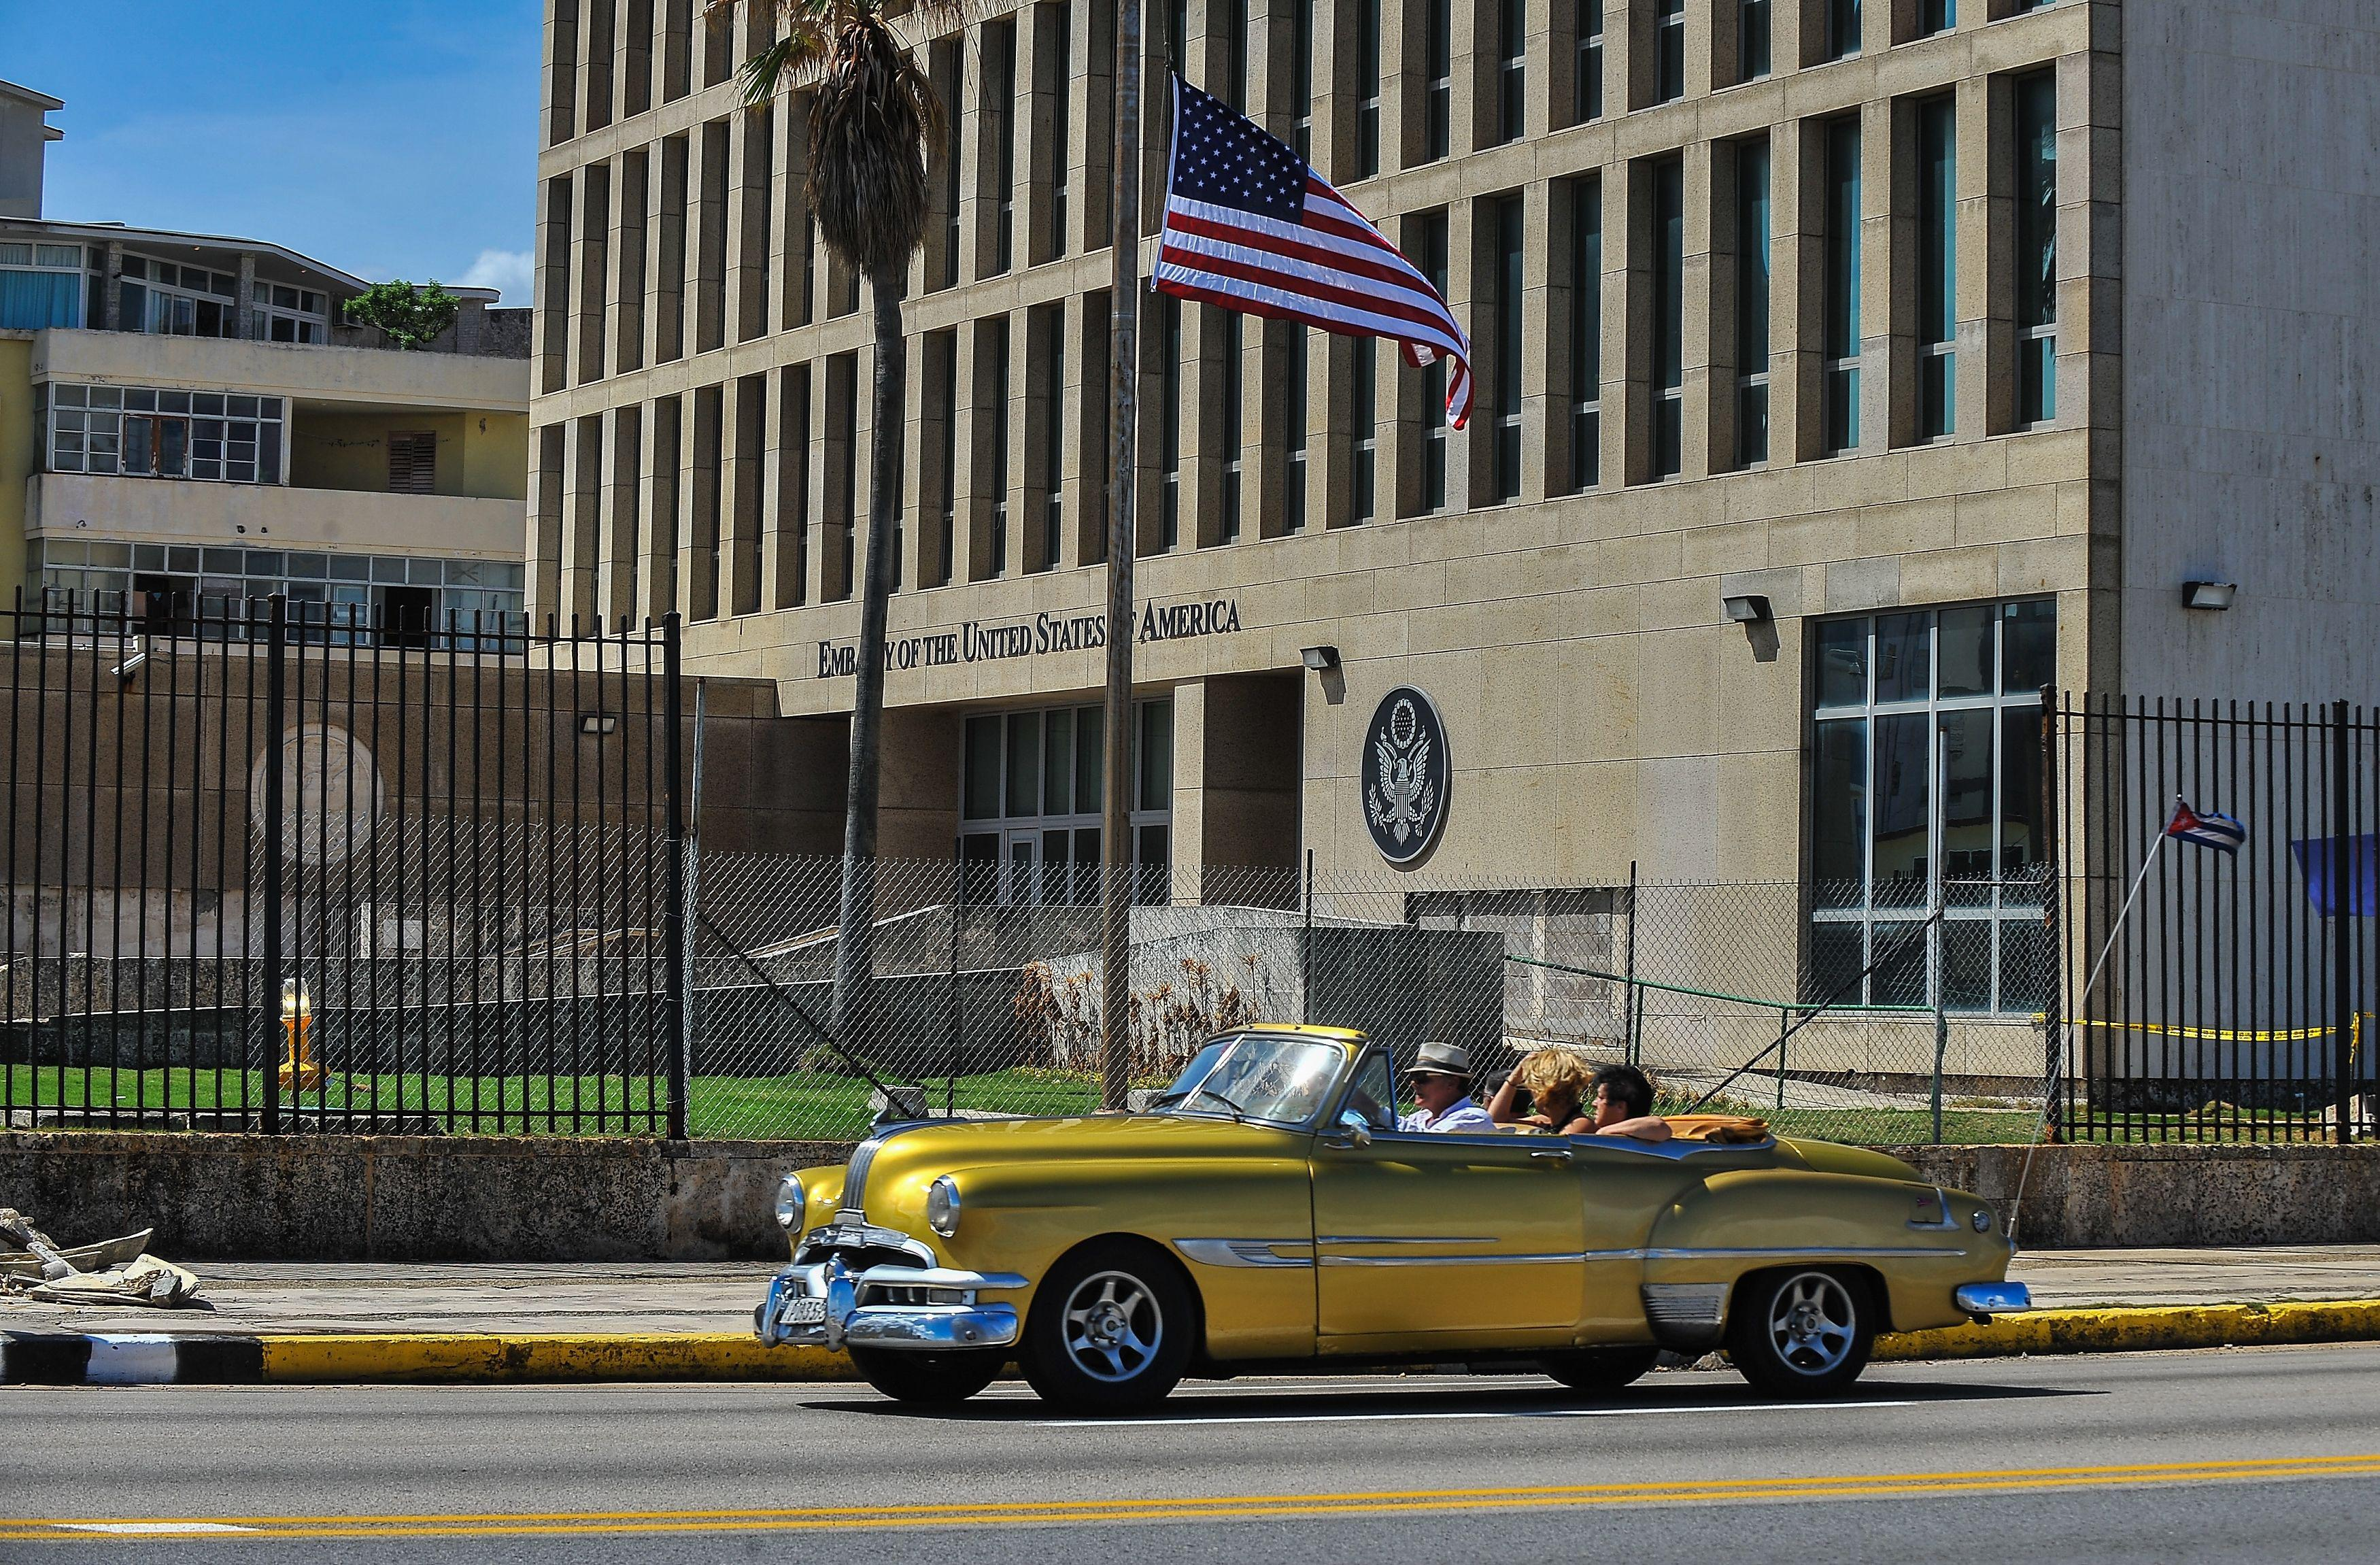 The U.S. Embassy in Havana, taken on Oct. 3.